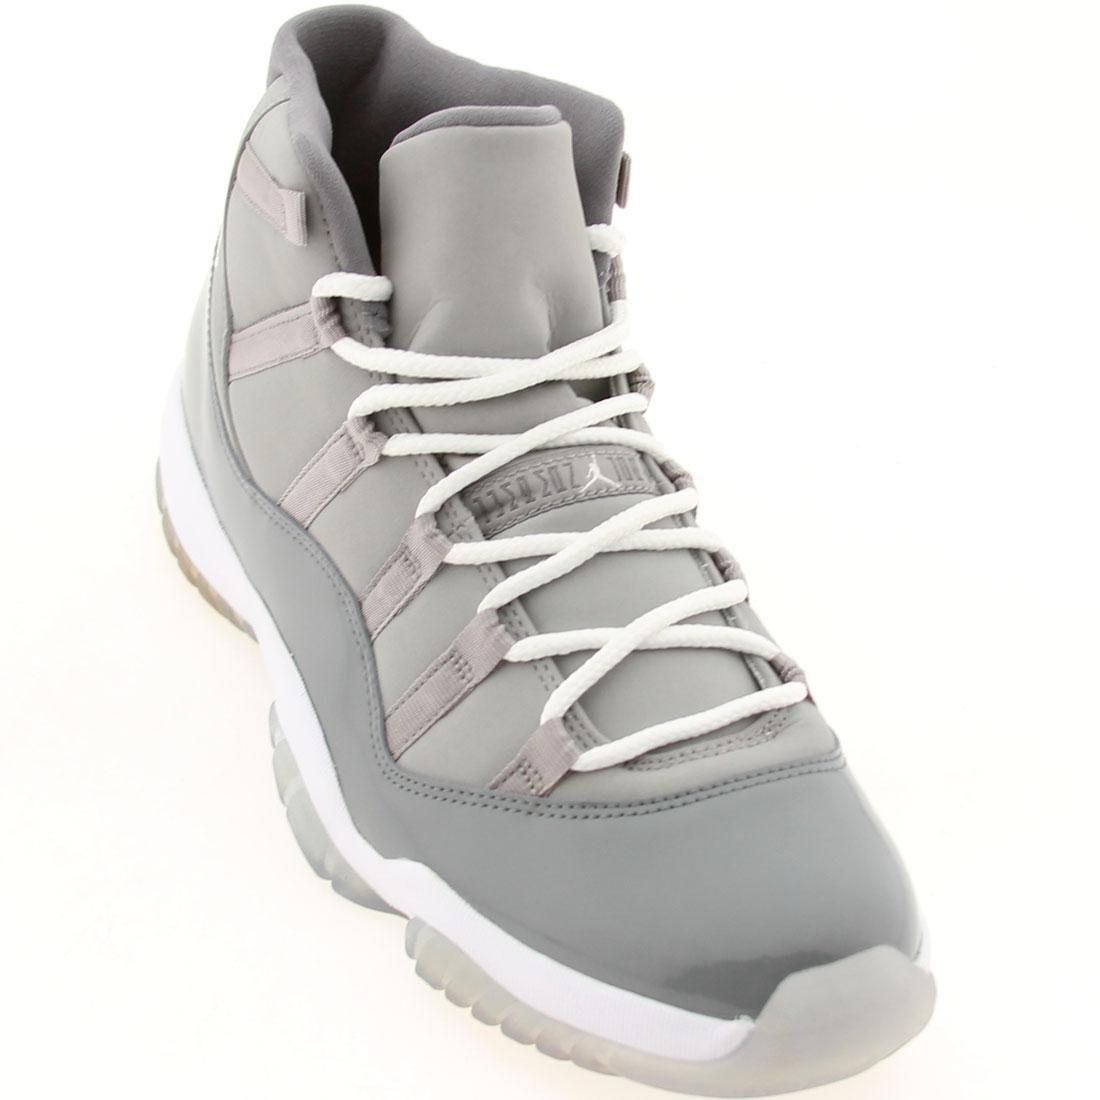 Nike Herren Air Jordan 11 Retro Turnschuhe  12.5|Medium Grey, White-cool Grey